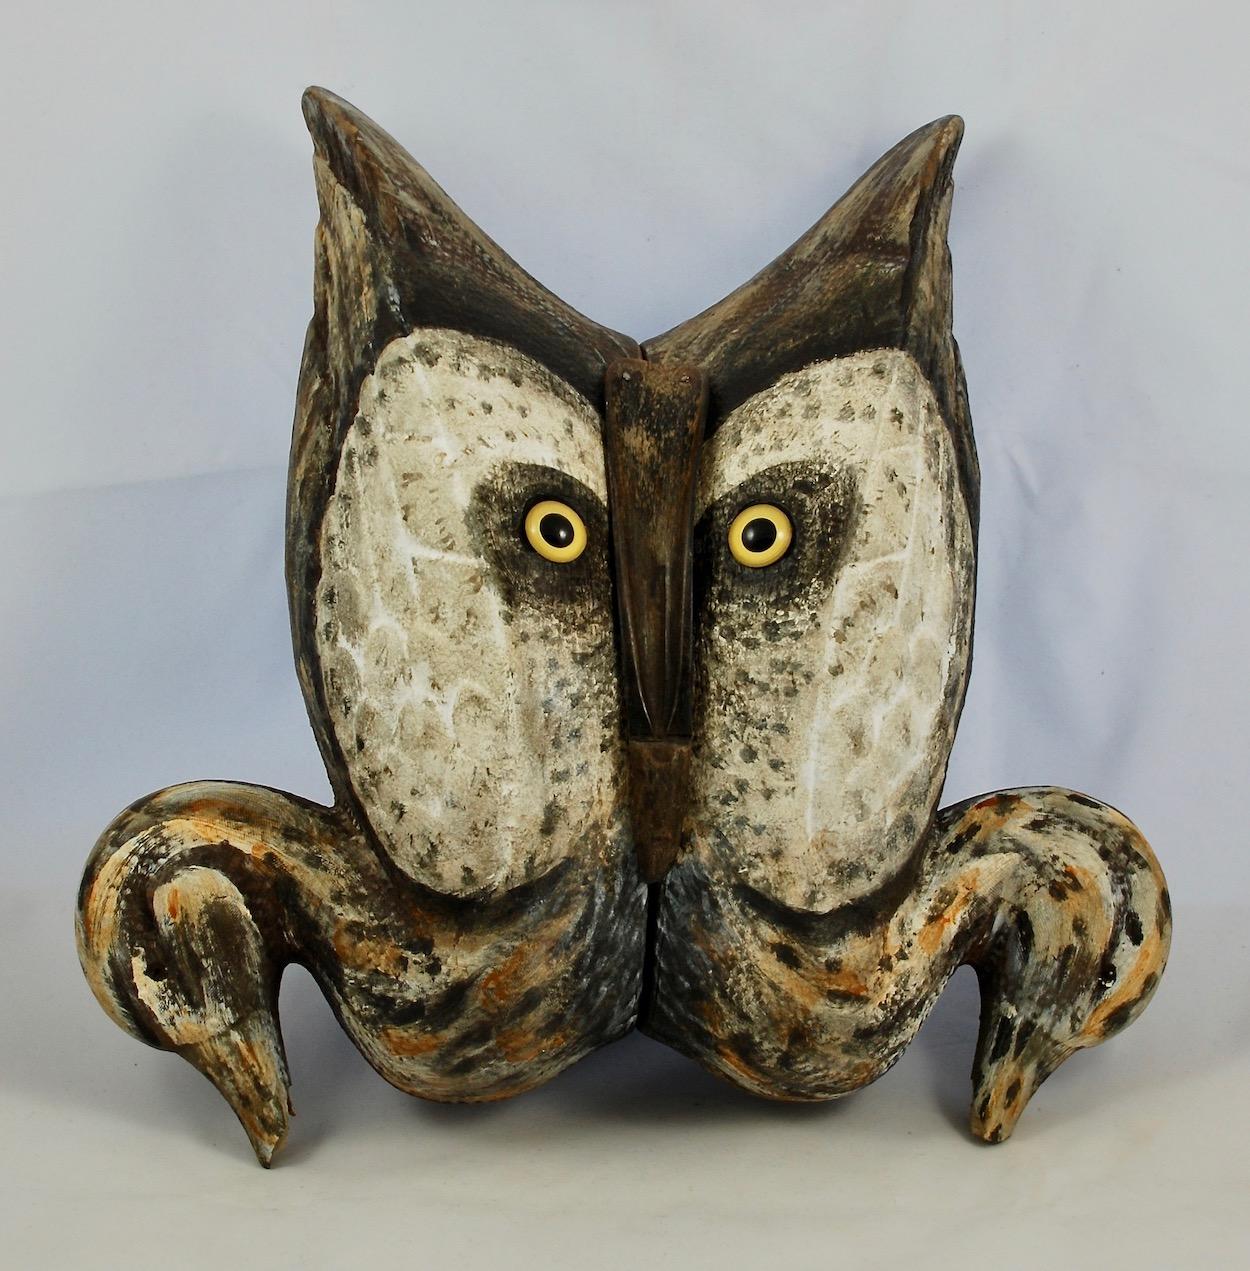 Shoehorn Owl